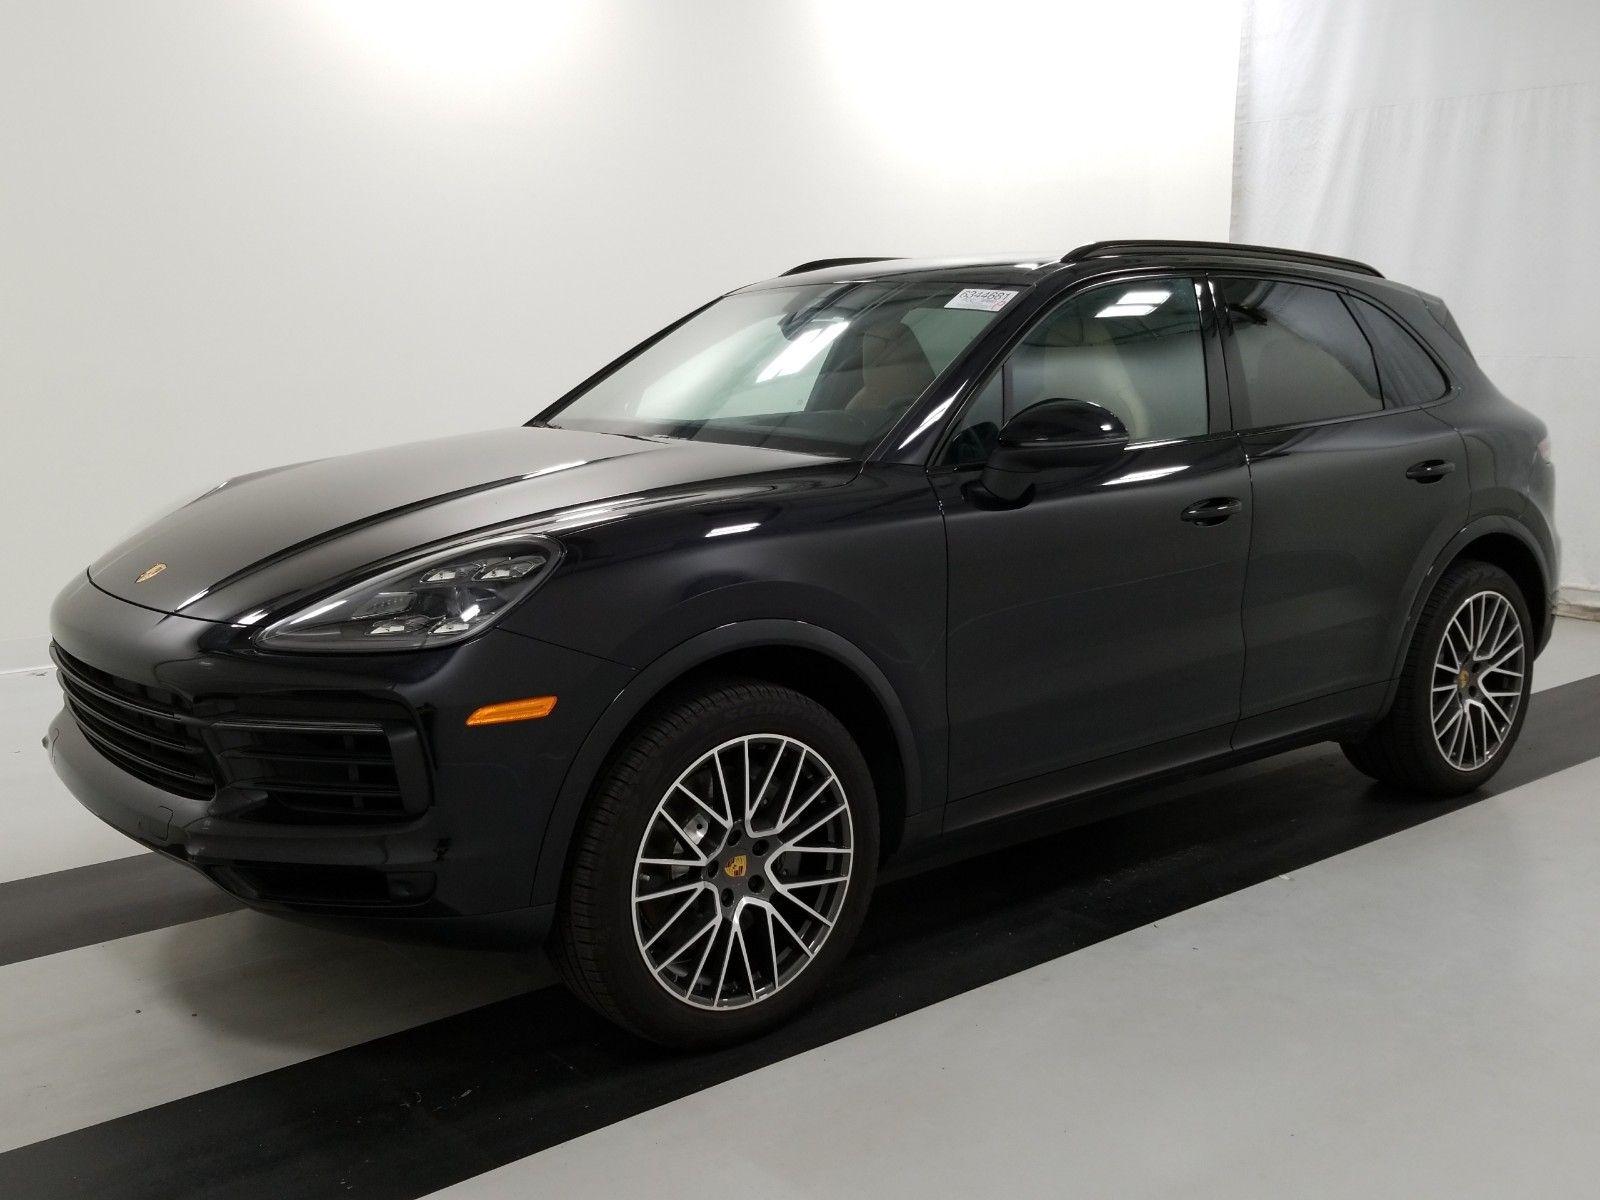 2019 Porsche Cayenne 2.9. Lot 99920814912 Vin WP1AB2AYXKDA64281